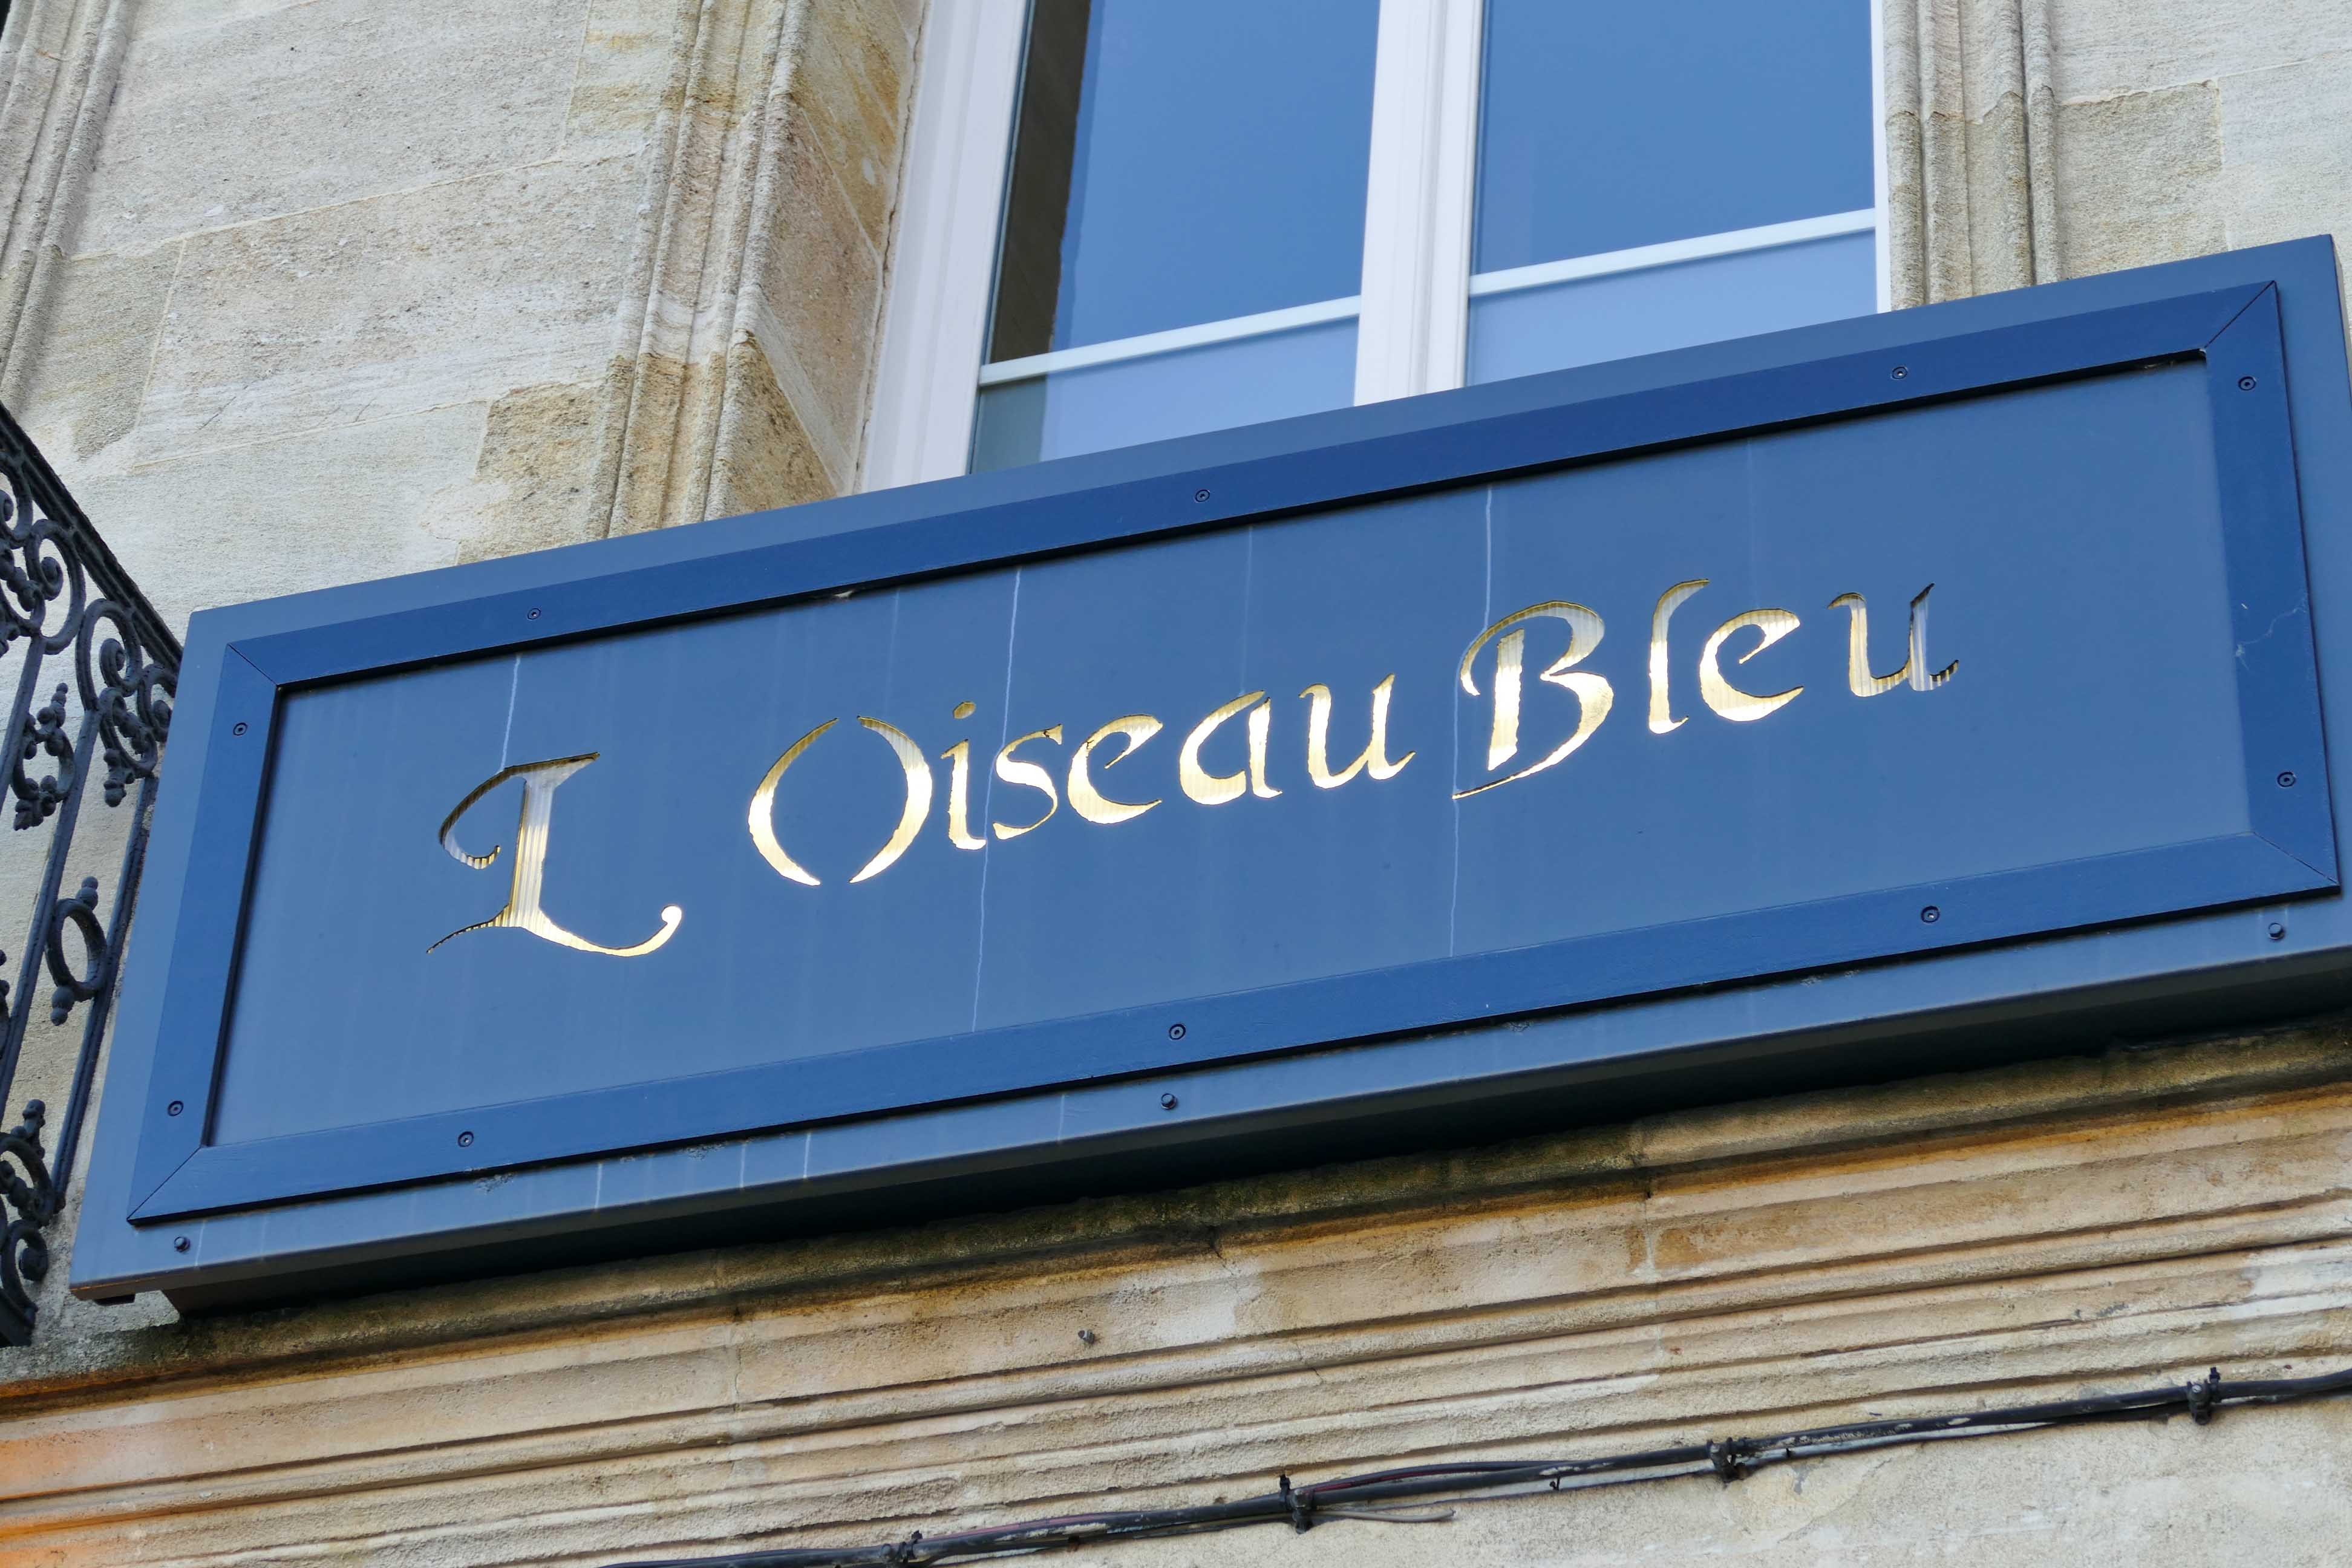 Beautiful l oiseau bleu bordeaux photos - Restaurant l oiseau bleu ...